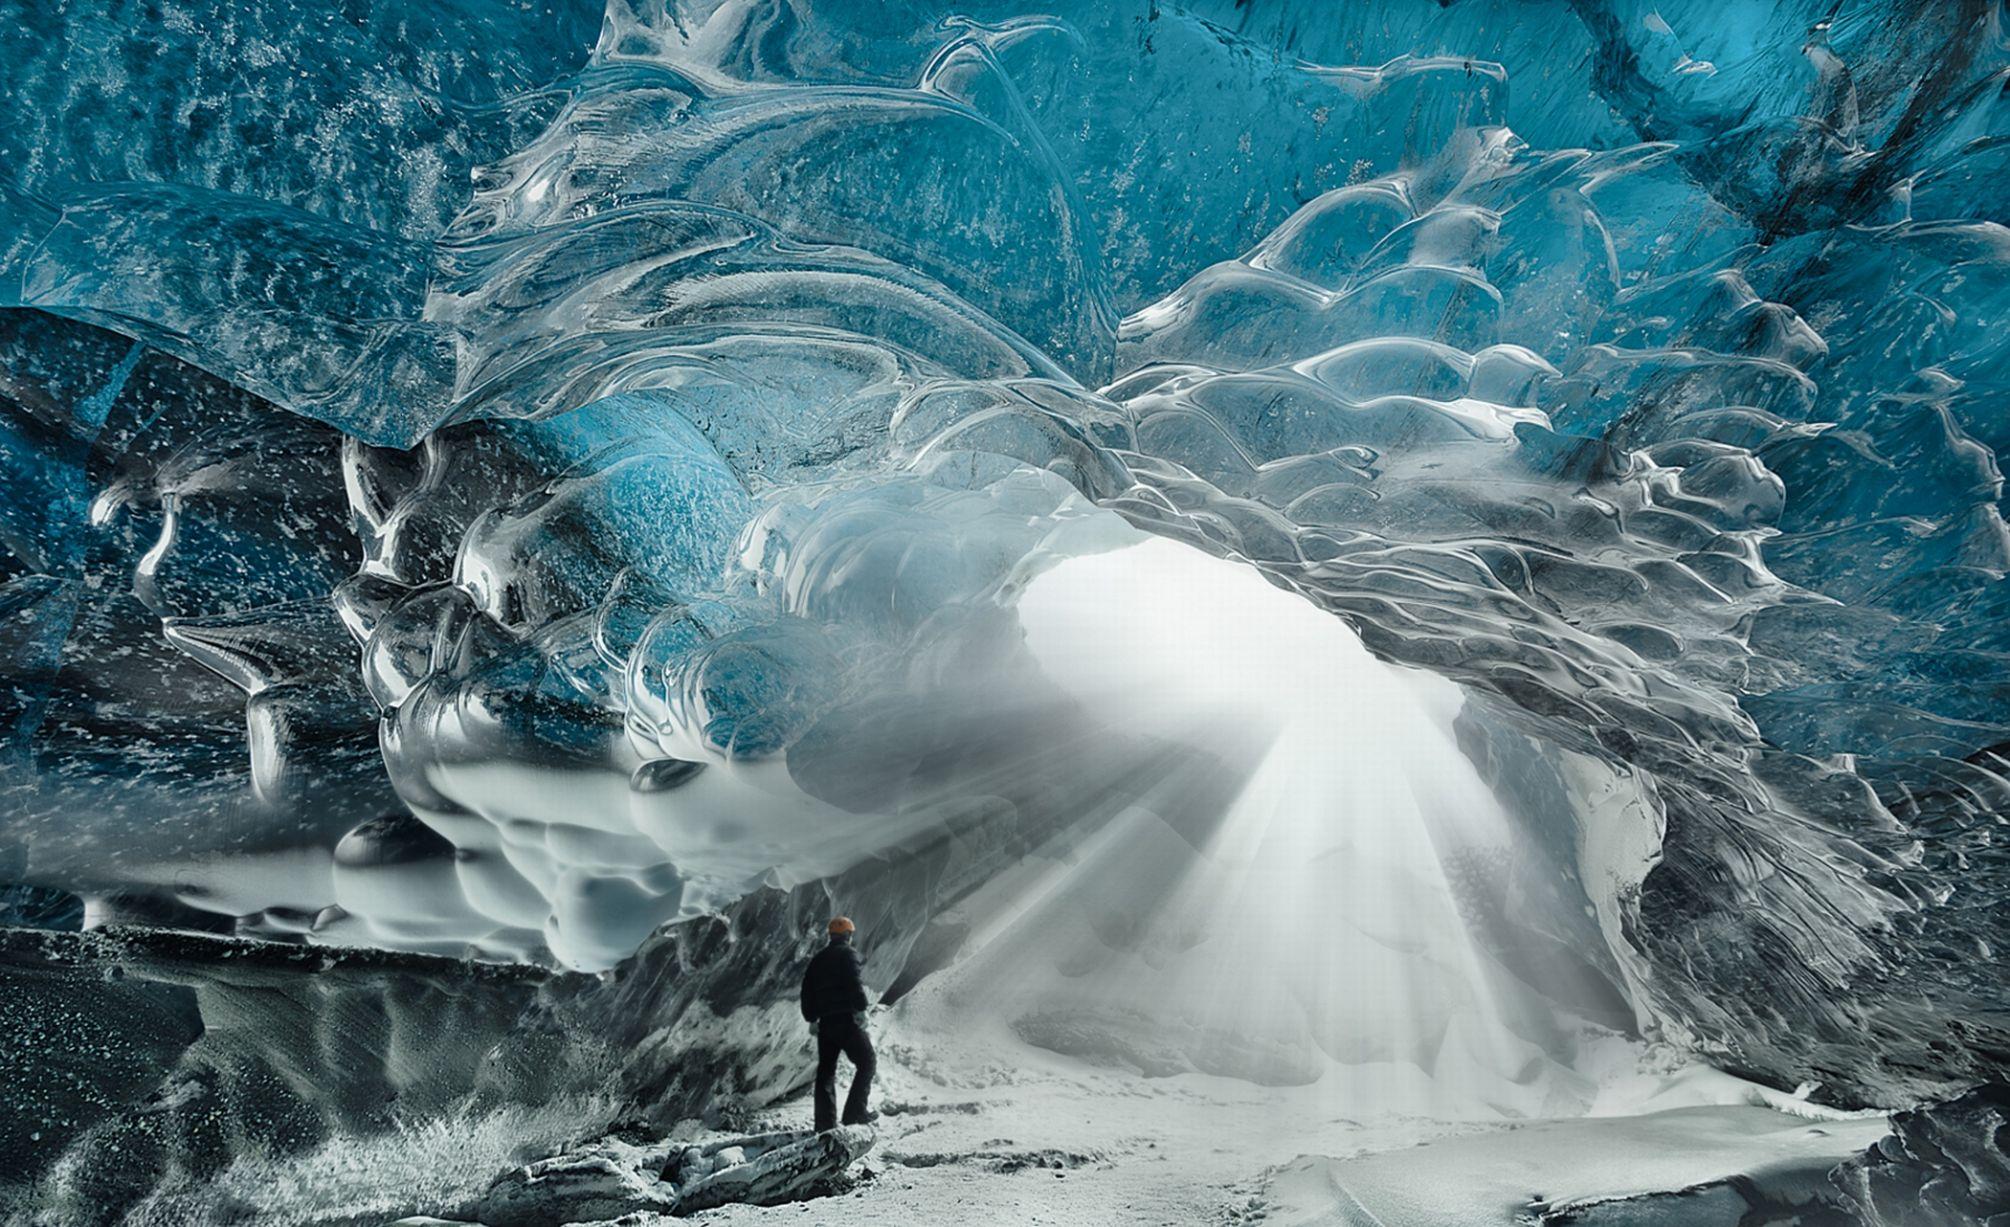 Caverne de glace au Jokulsarlon en Islande (Photo: HotSpot Media)